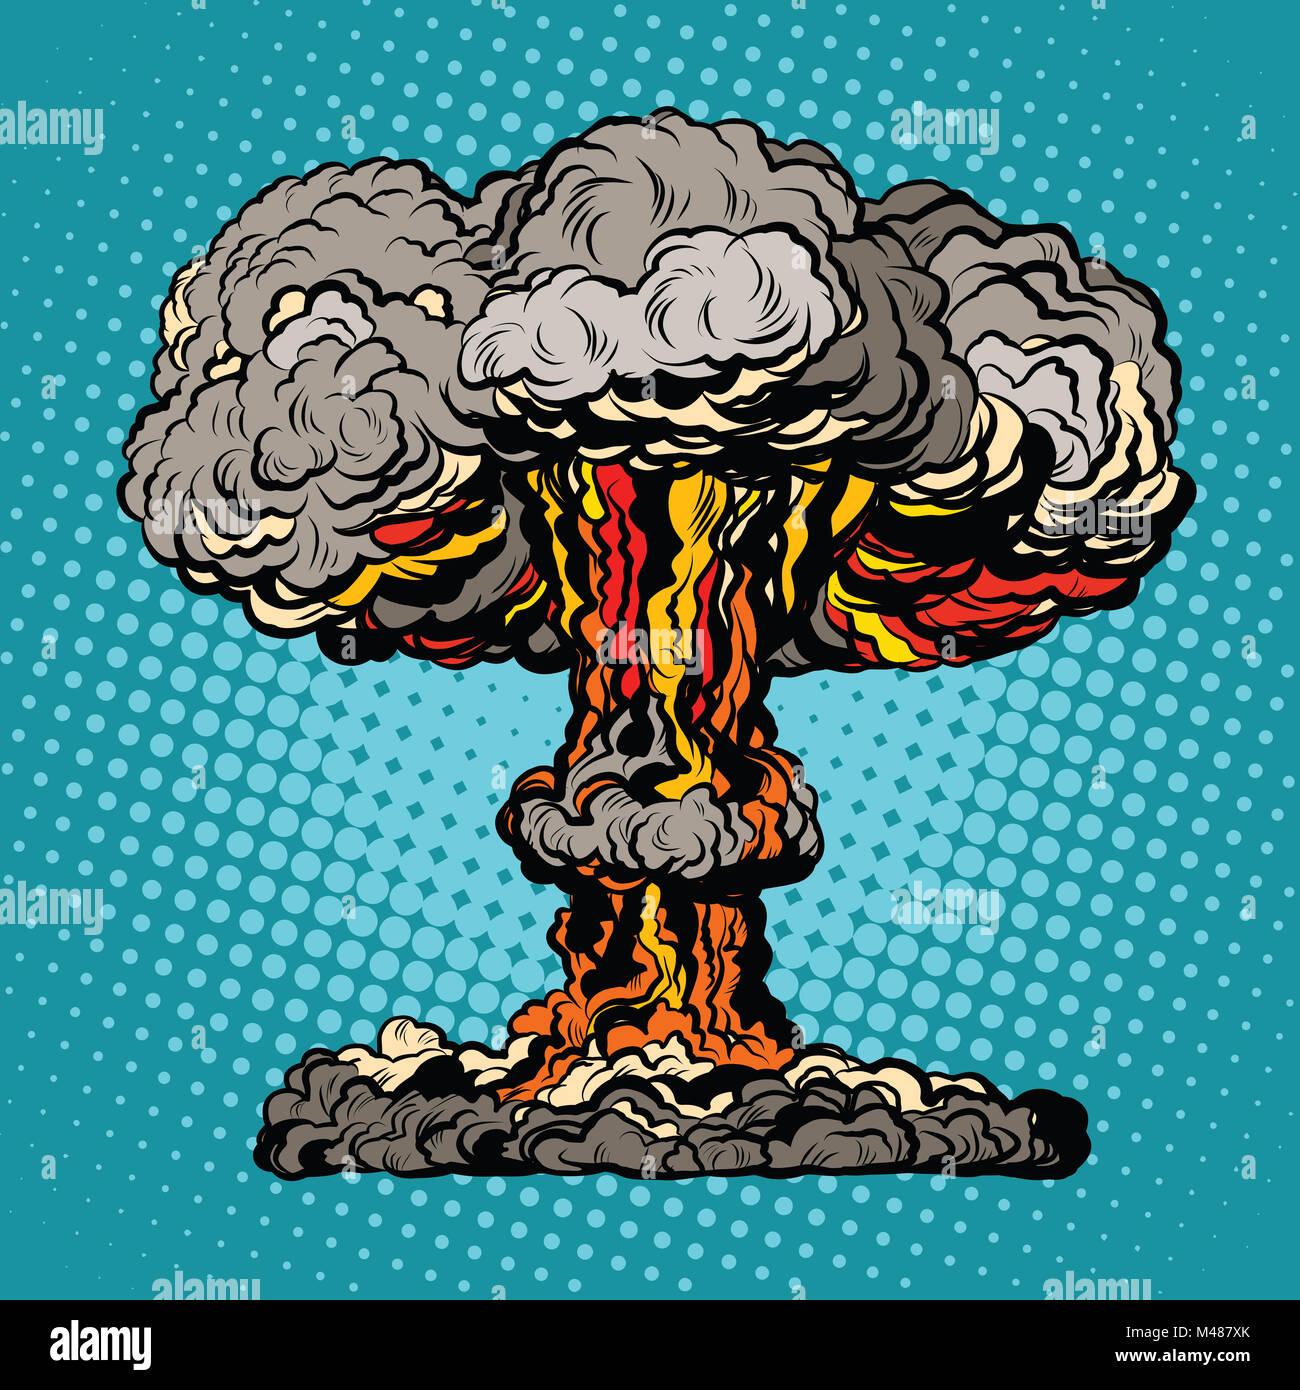 Nuclear explosion radioactive mushroom pop art - Stock Image